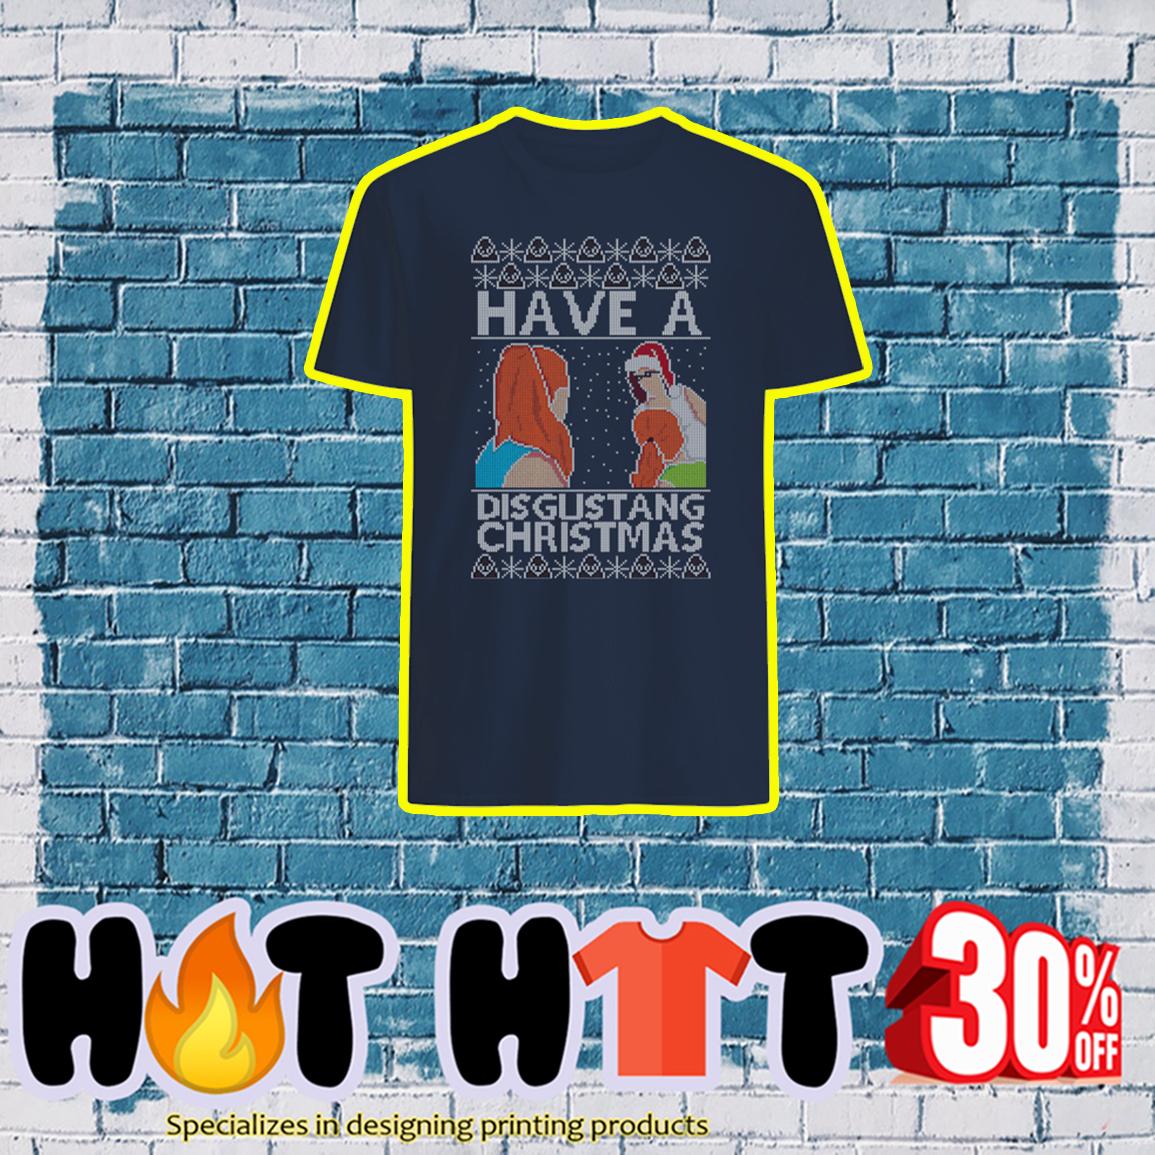 Have a disgustang christmas shirt